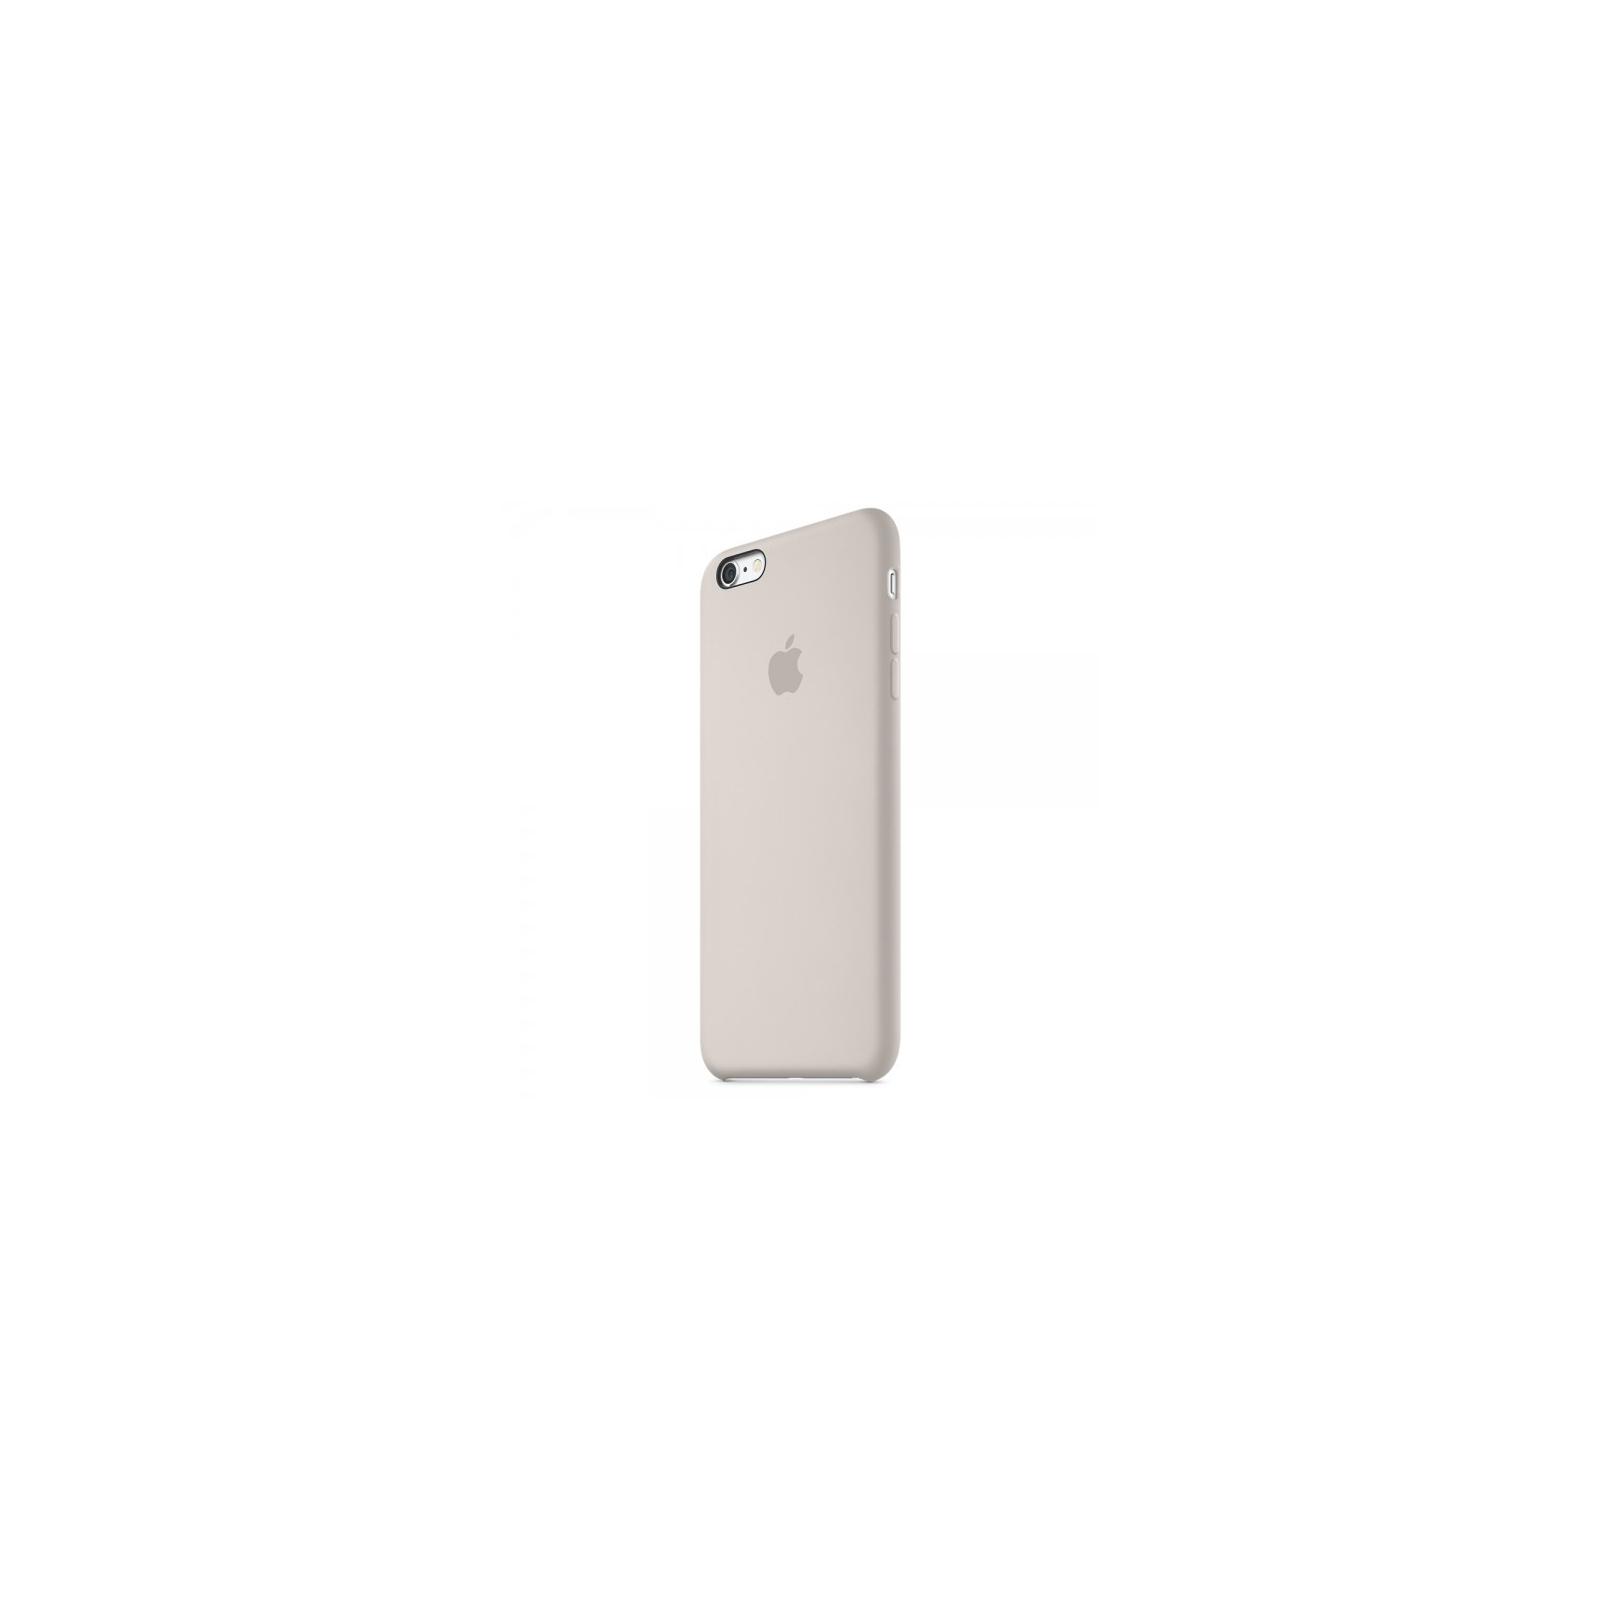 Чехол для моб. телефона Apple для iPhone 6 Plus/6s Plus Stone (MKXN2ZM/A) изображение 2